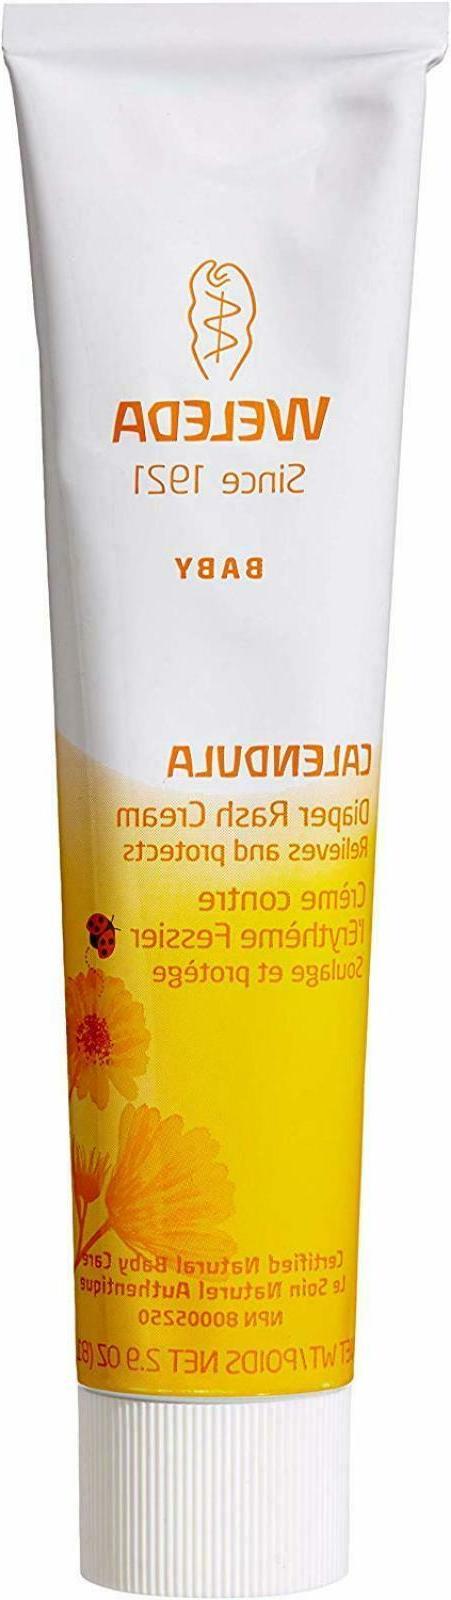 weleda diaper rash cream calendula gentle relief